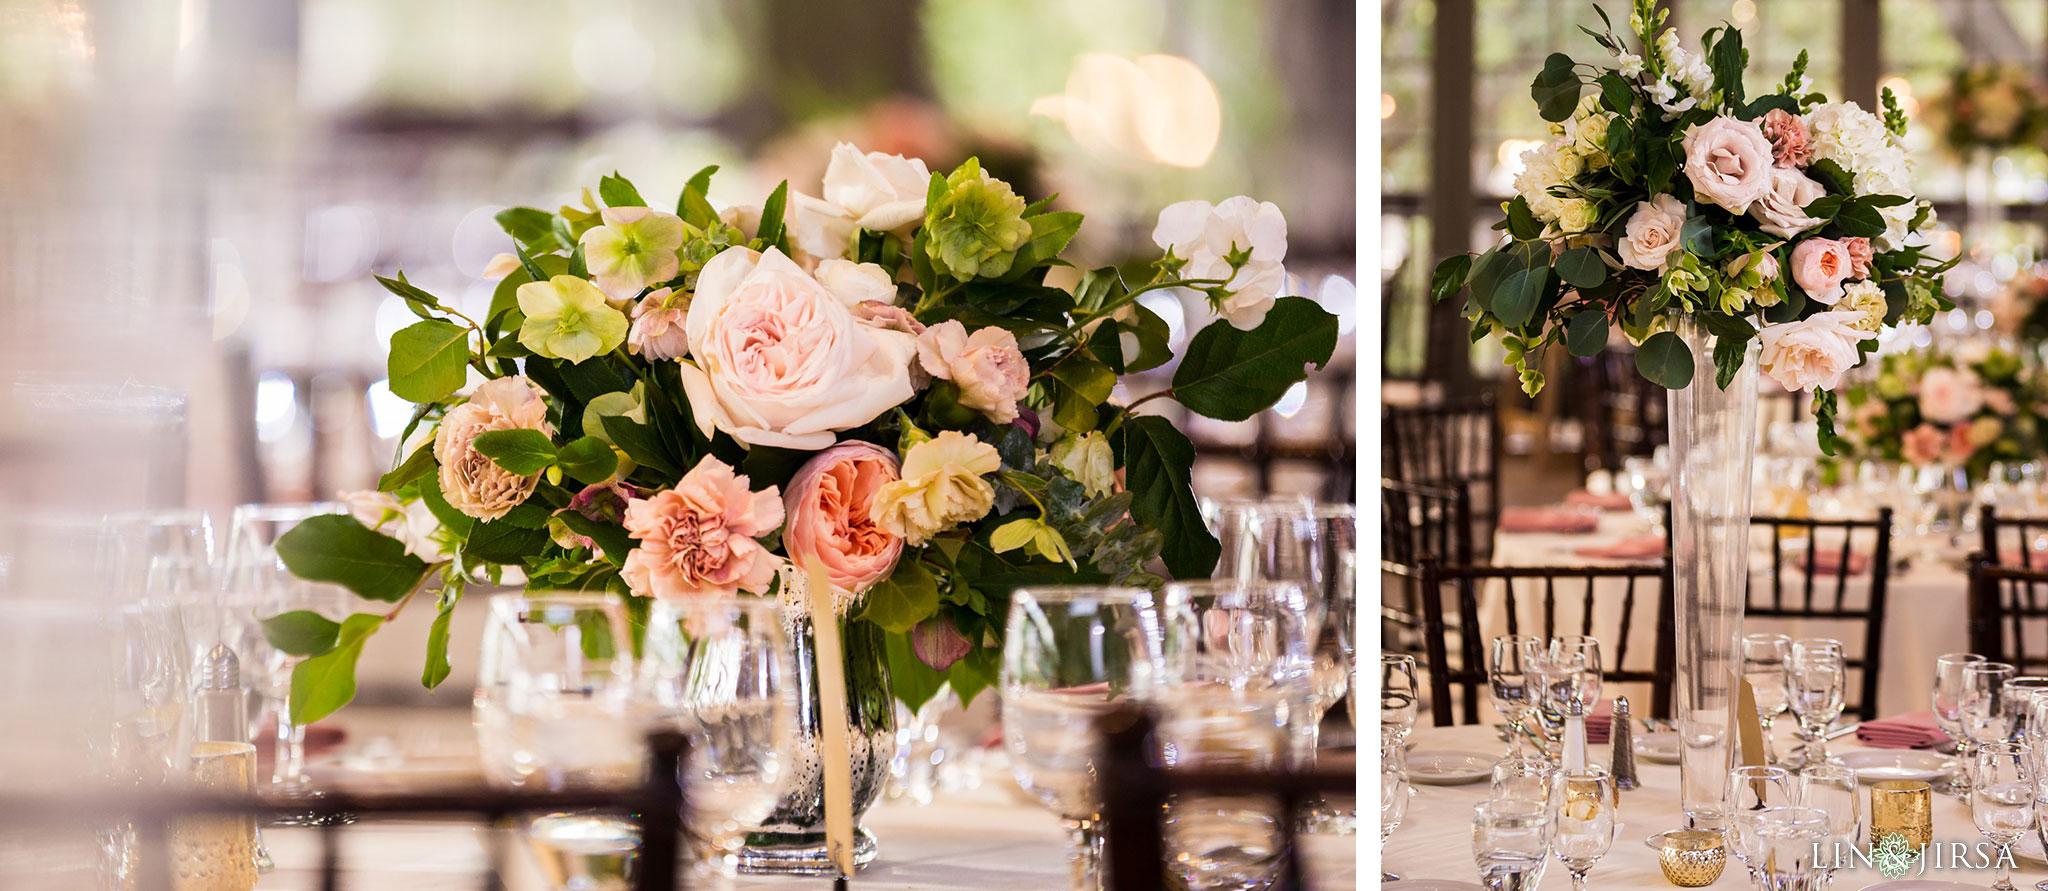 26 calamigos ranch malibu wedding reception photography